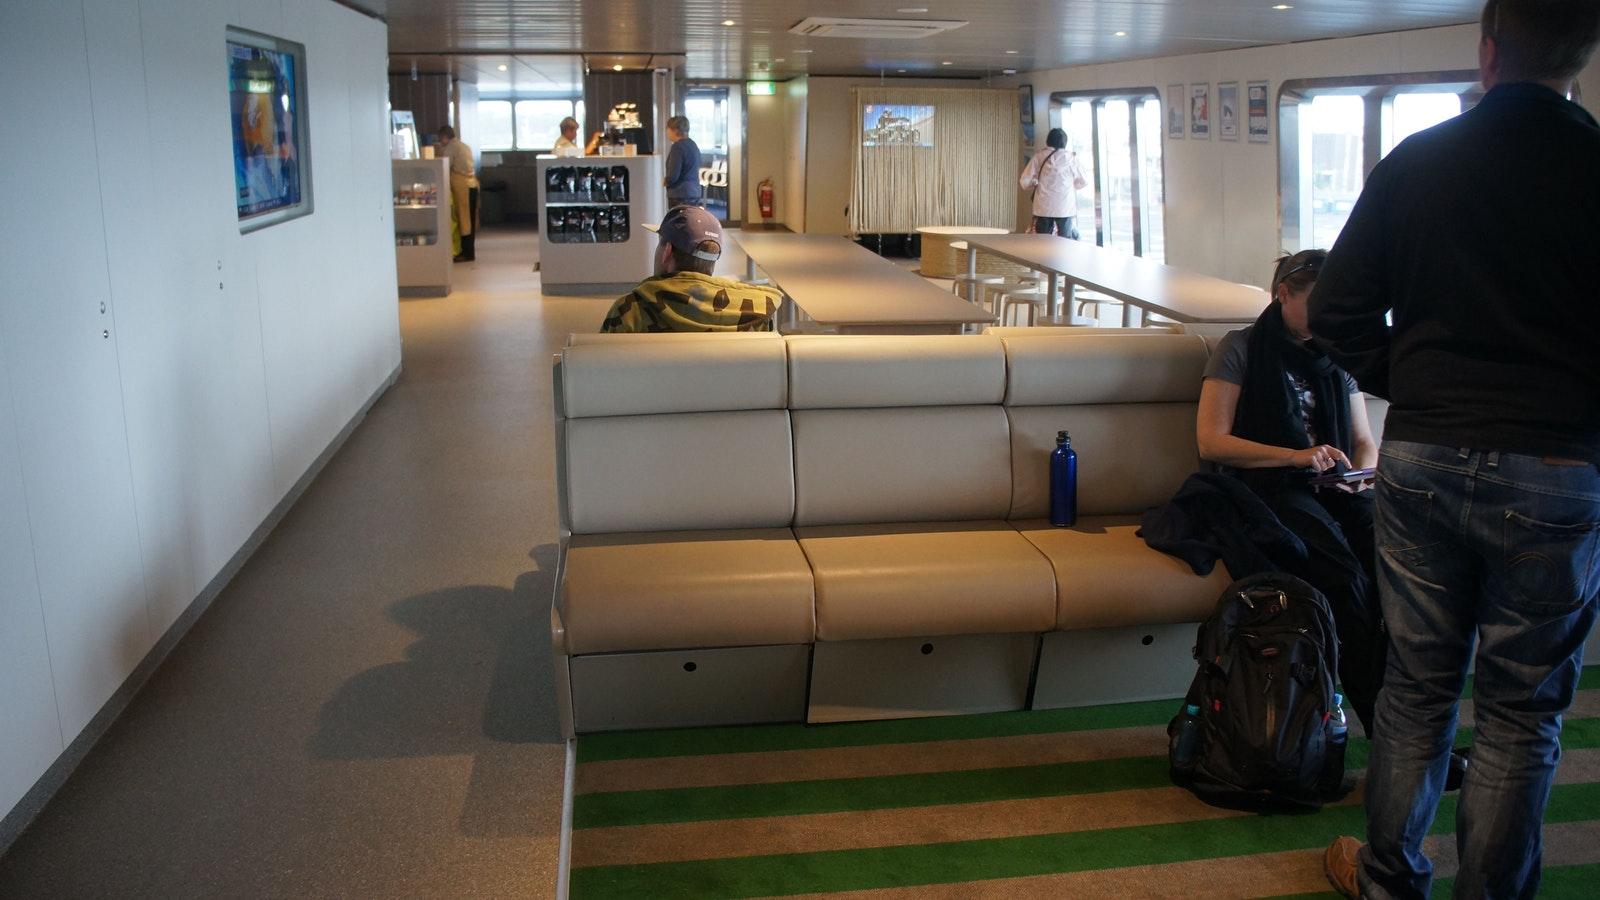 Original__9614579_DN16_Lobby_in_the_Ferry.JPG